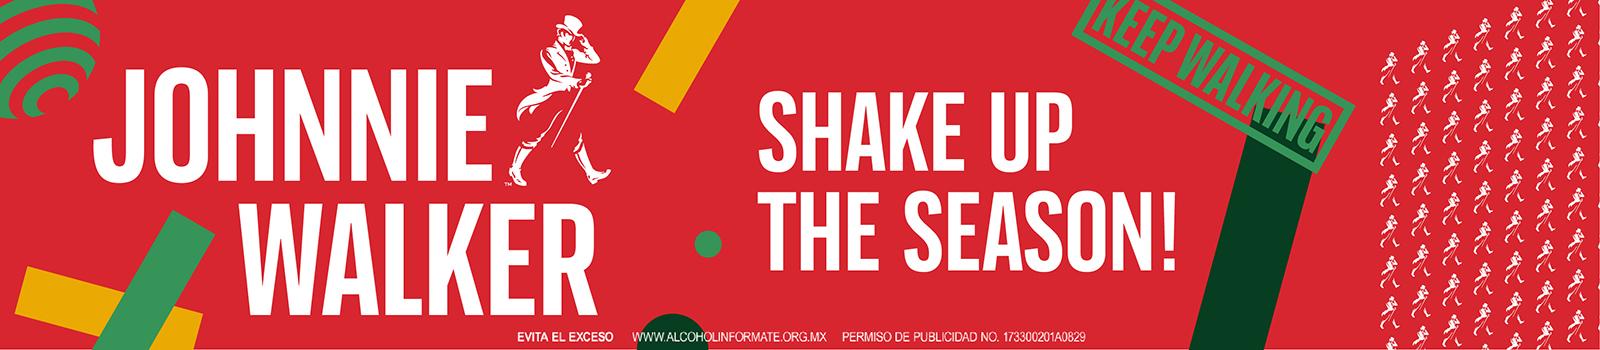 Shake up the season